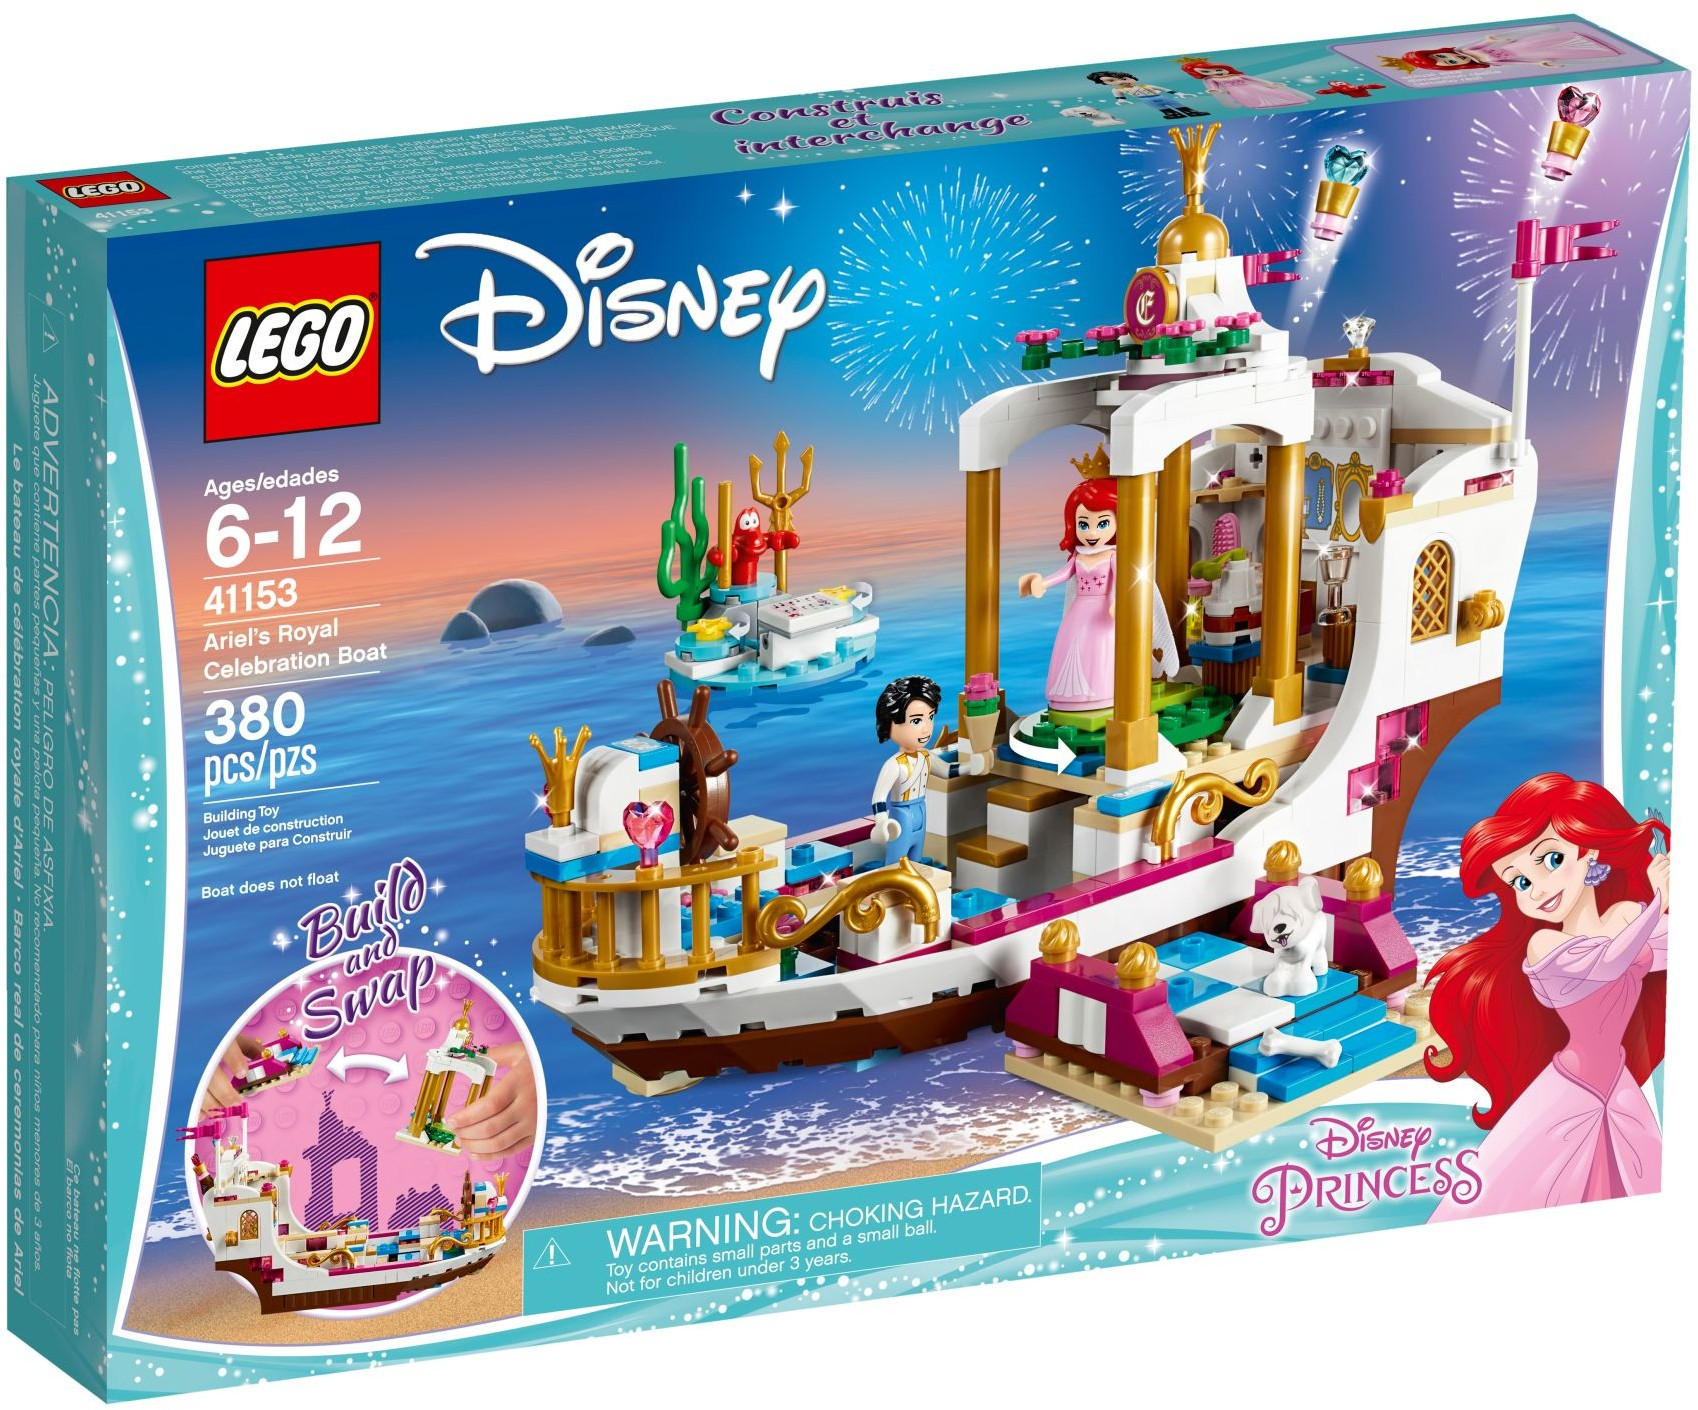 41153 Ariel's Royal Celebration Boat